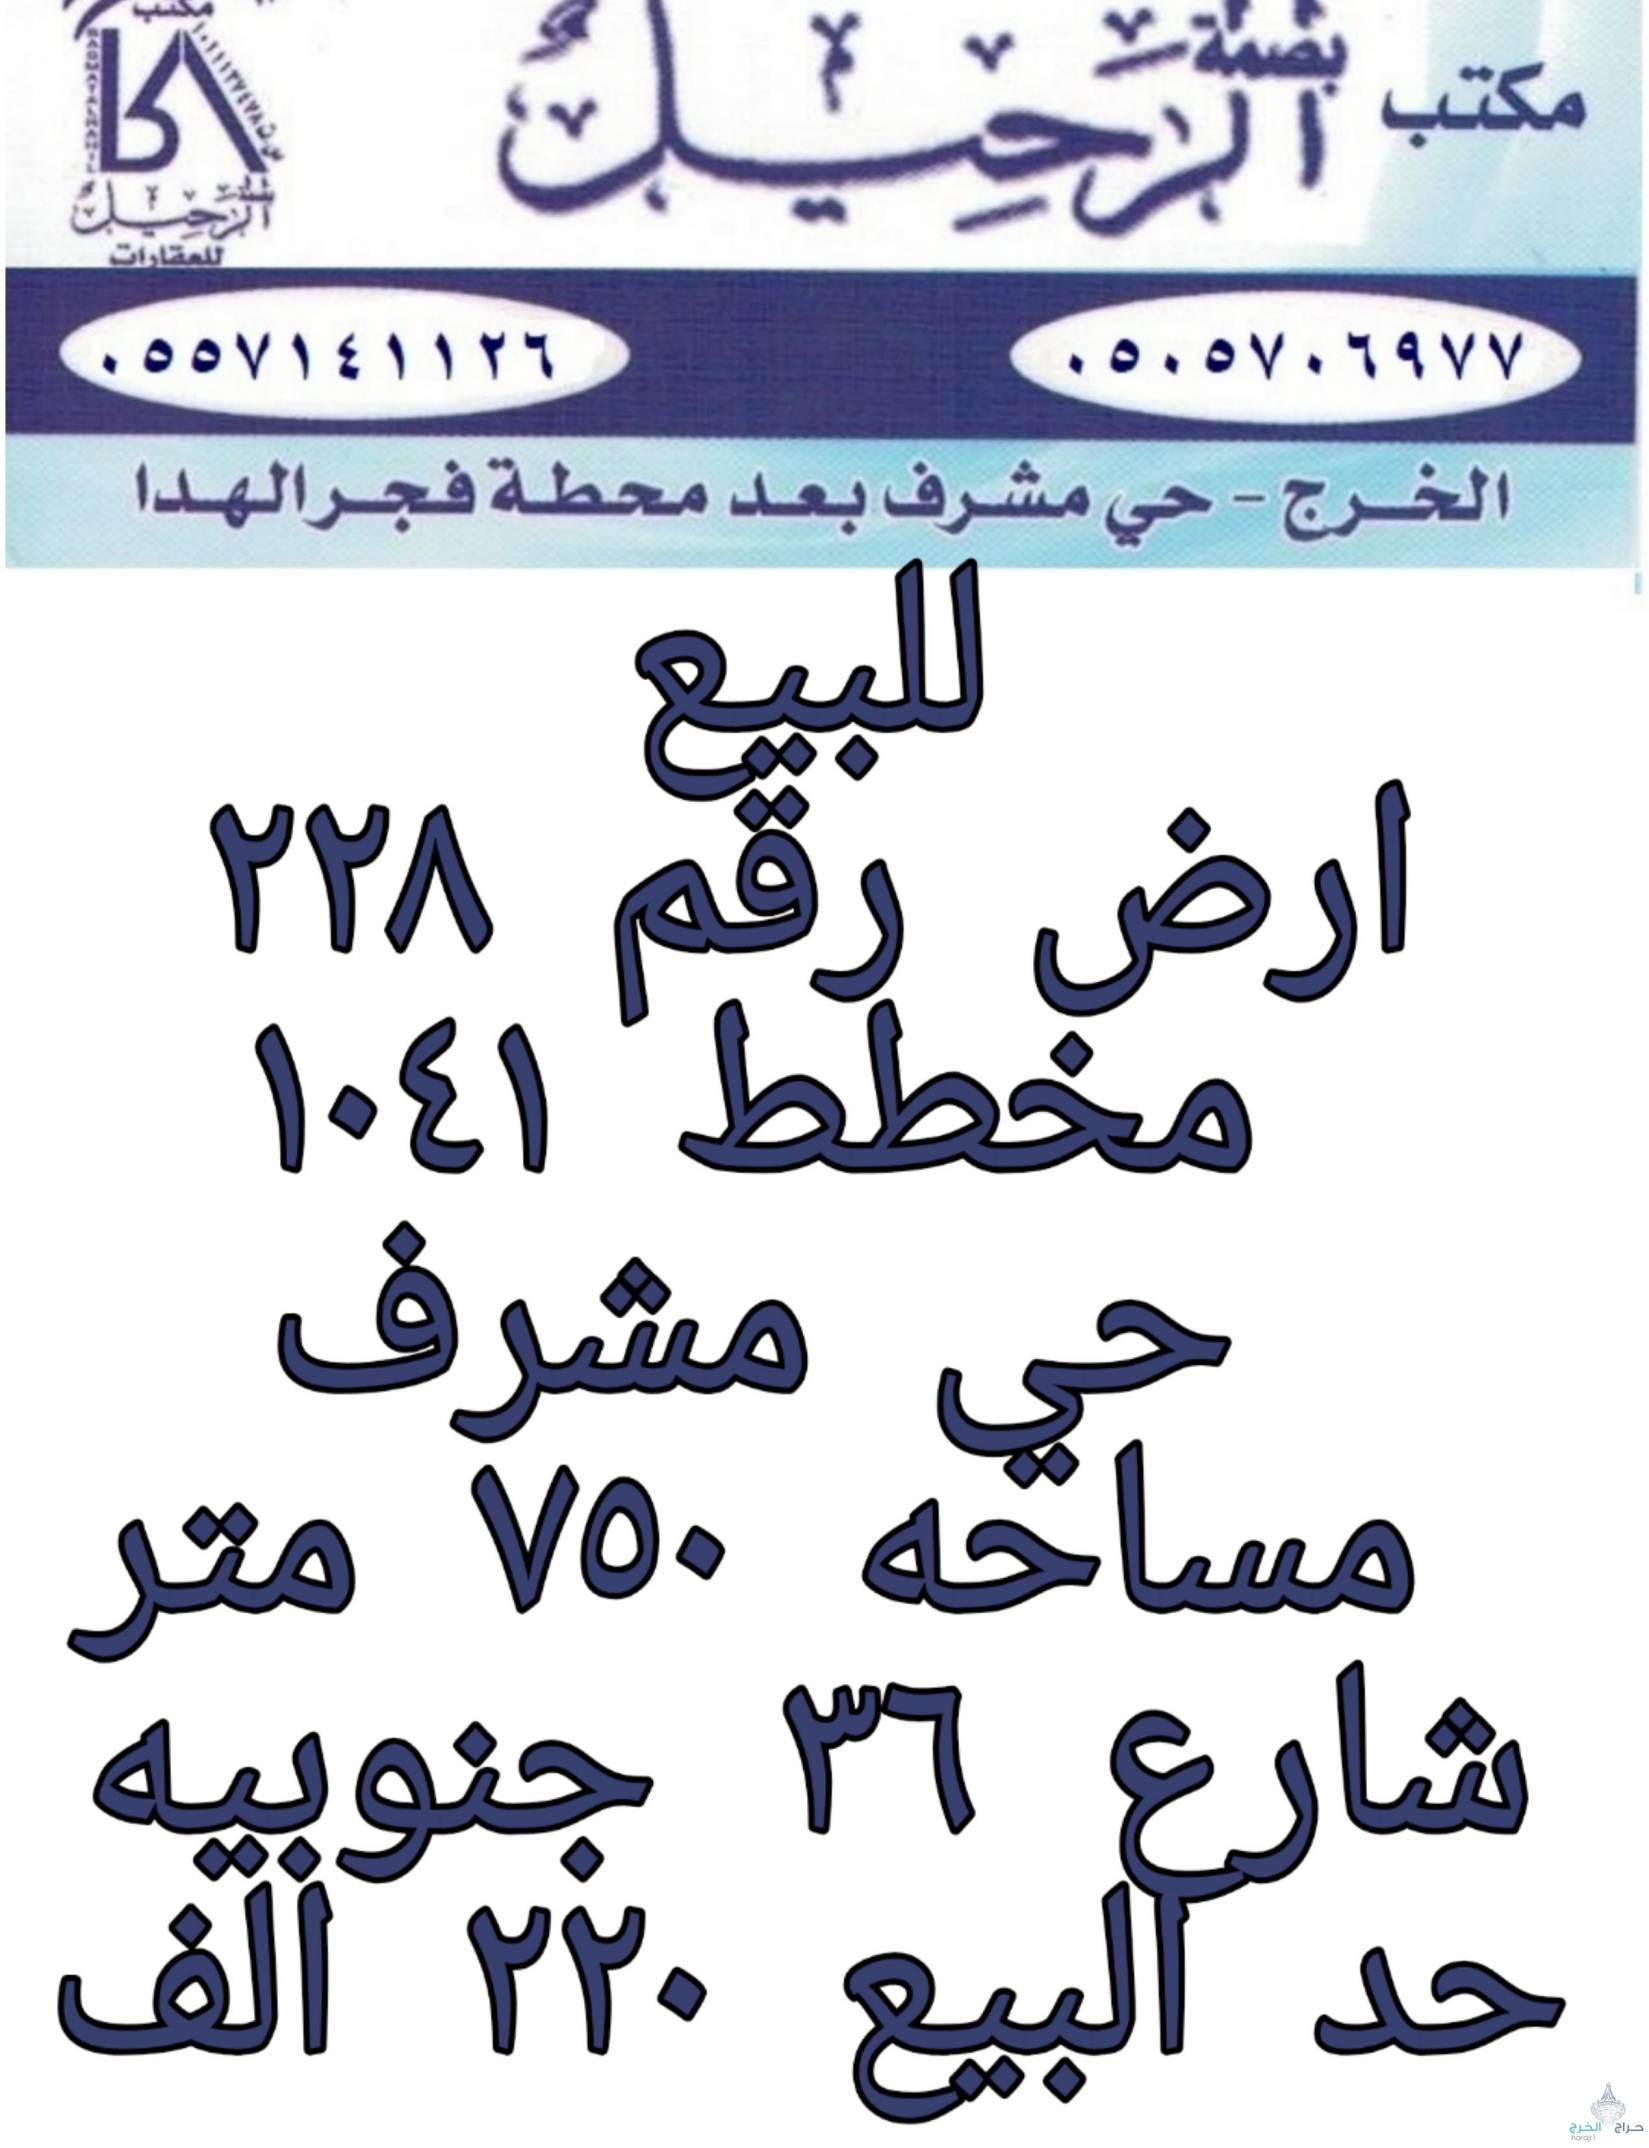 للبيع ارض رقم 228 مخطط 1041 حي مشرف